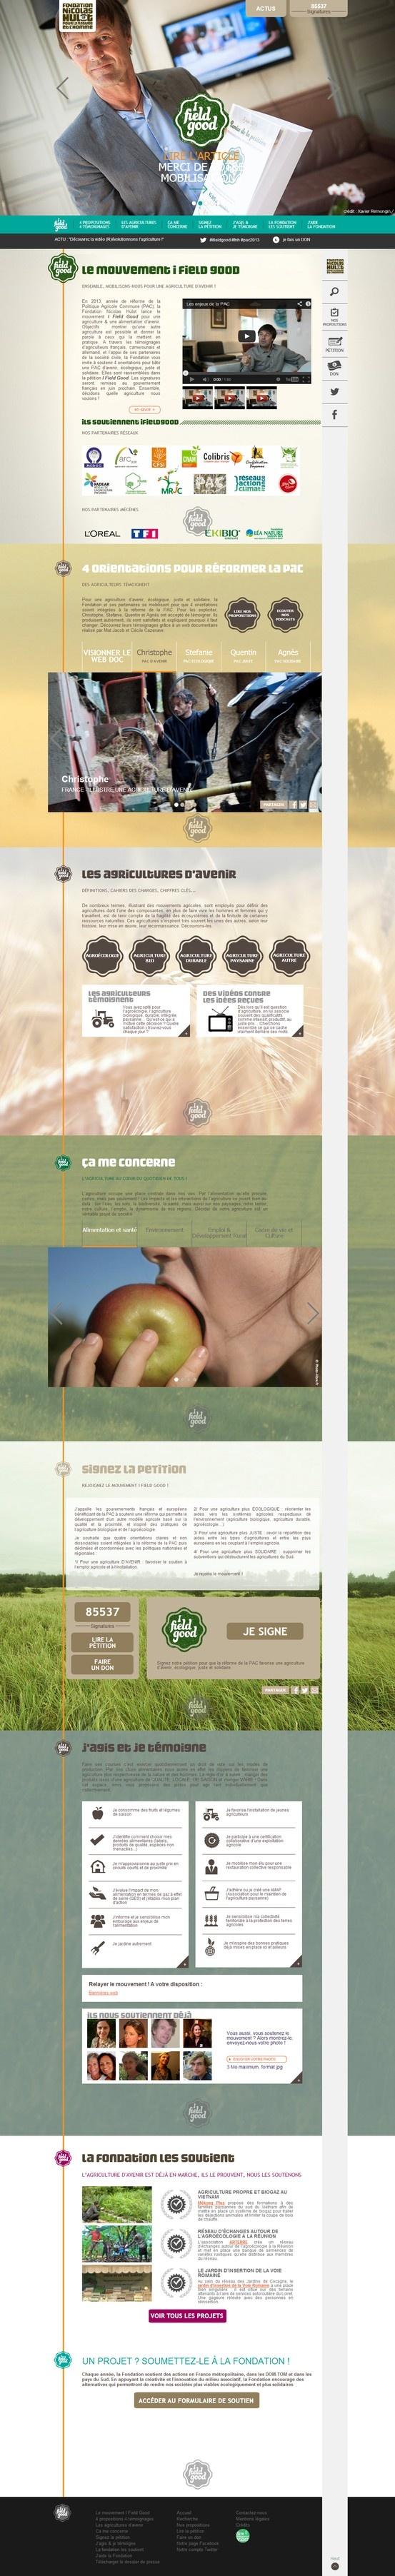 Site internet http://www.ifieldgood.org pour la Fondation Nicolas Hulot